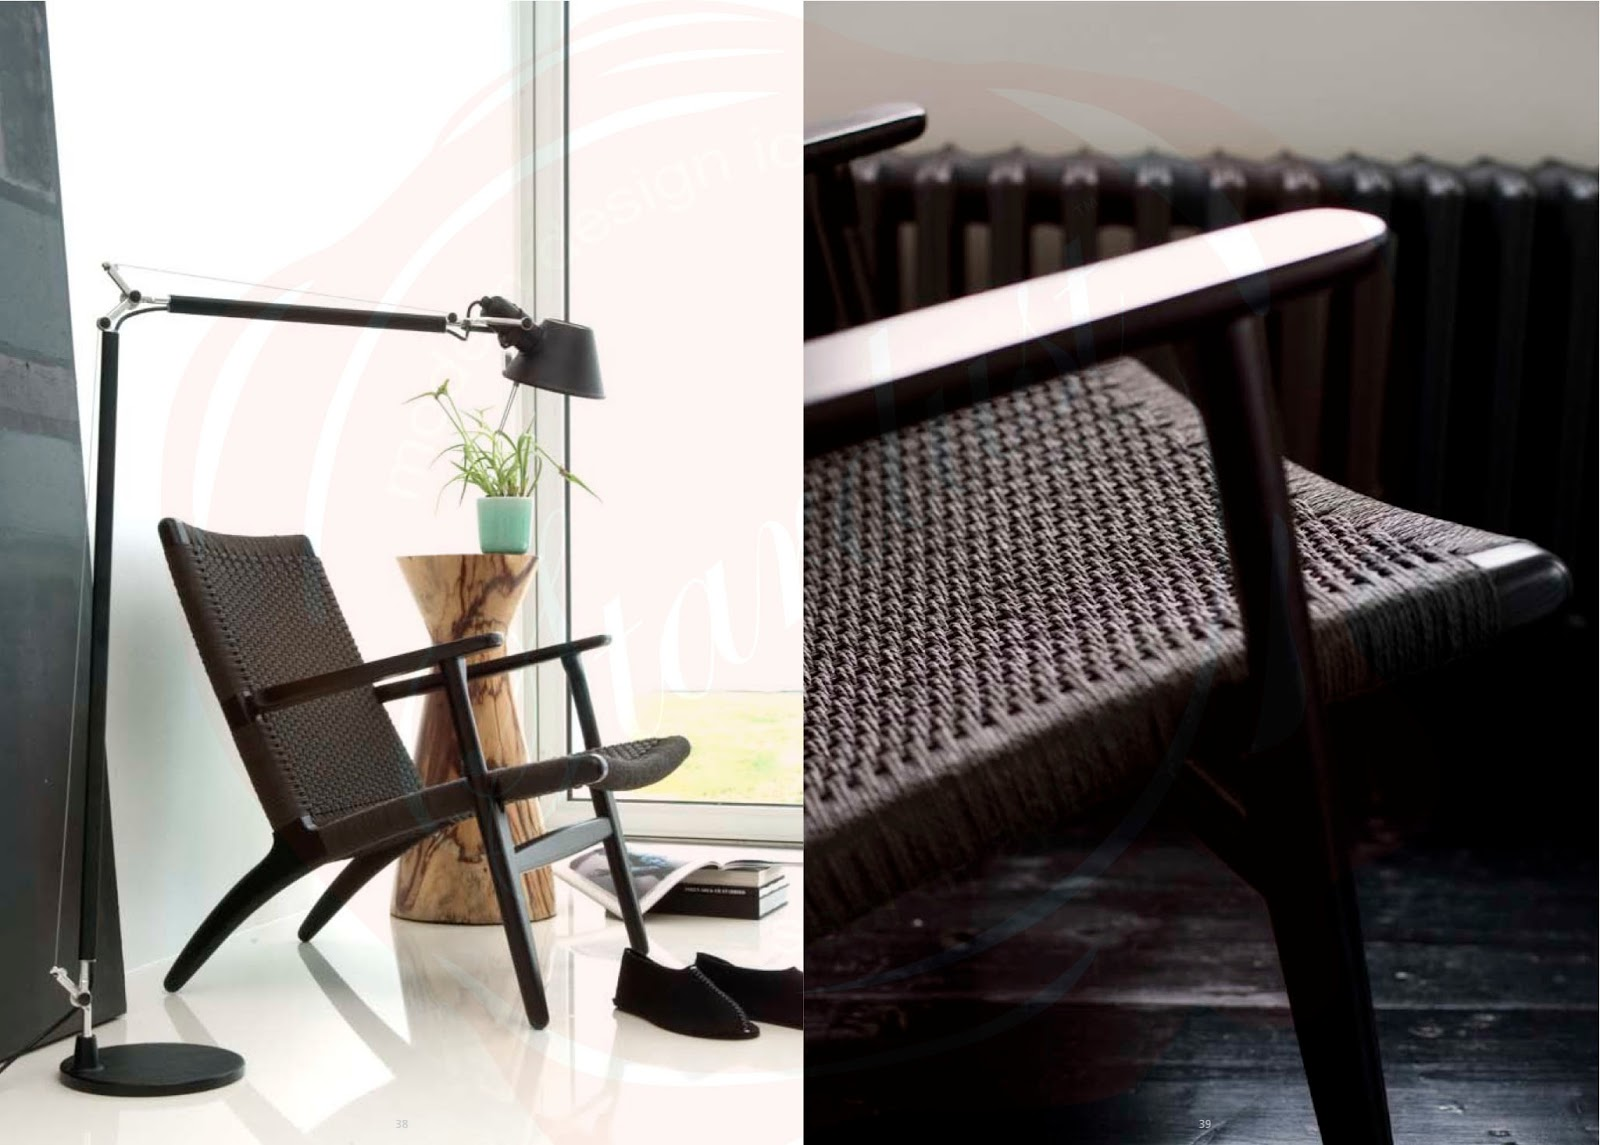 tolomeo floor light. Black Bedroom Furniture Sets. Home Design Ideas